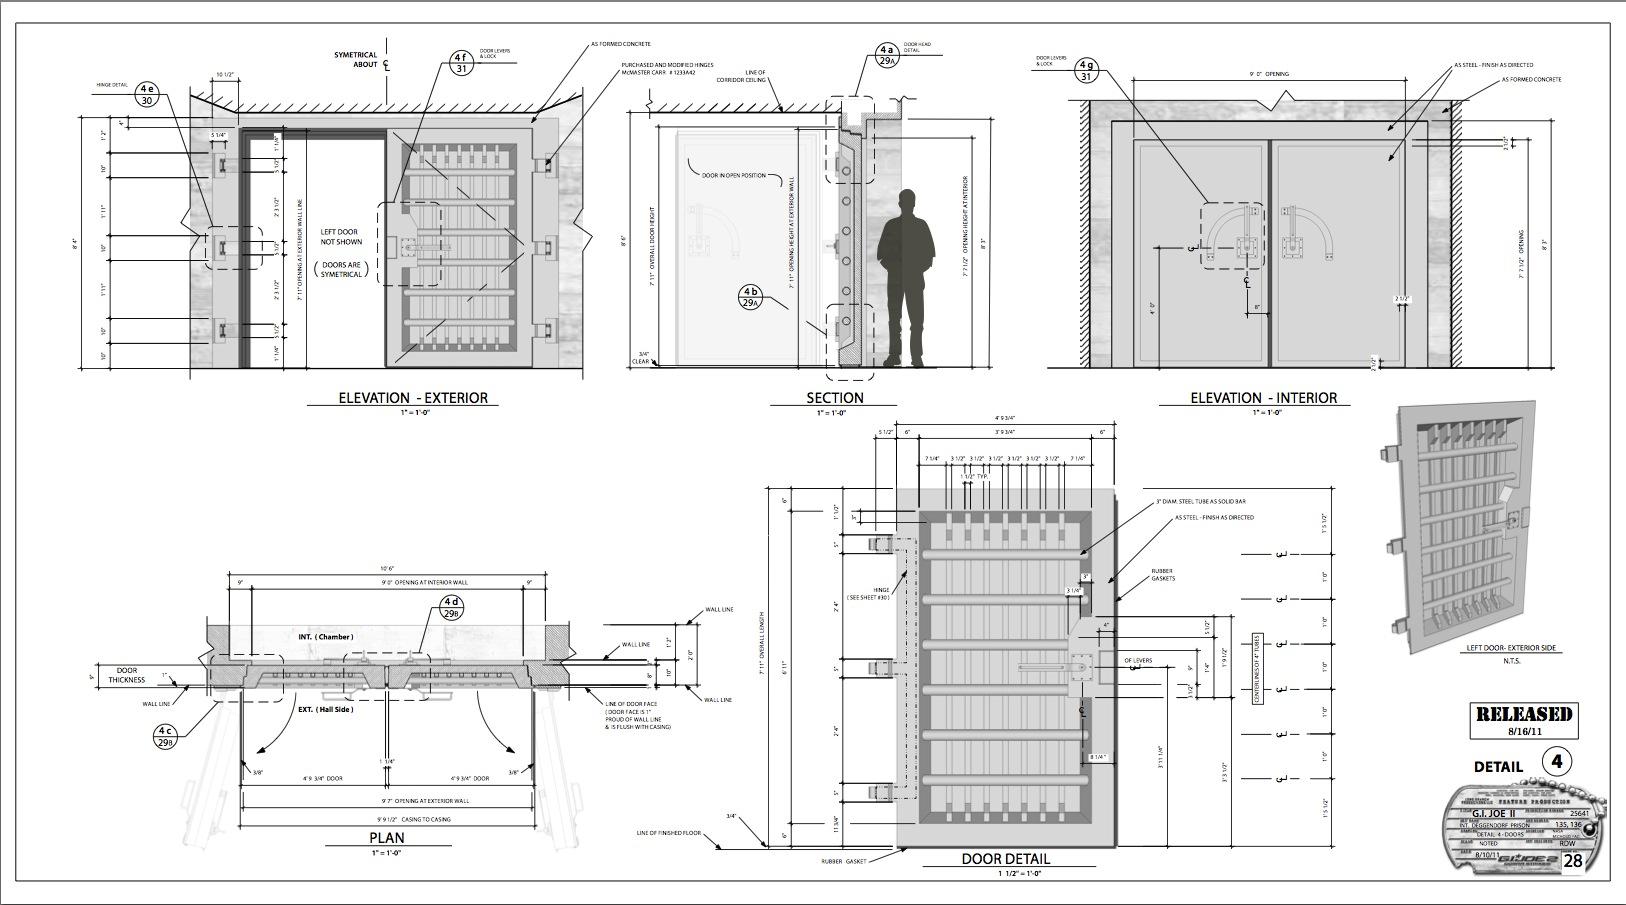 prison doors  sc 1 st  The Designeru0027s Assistant & prison doors |